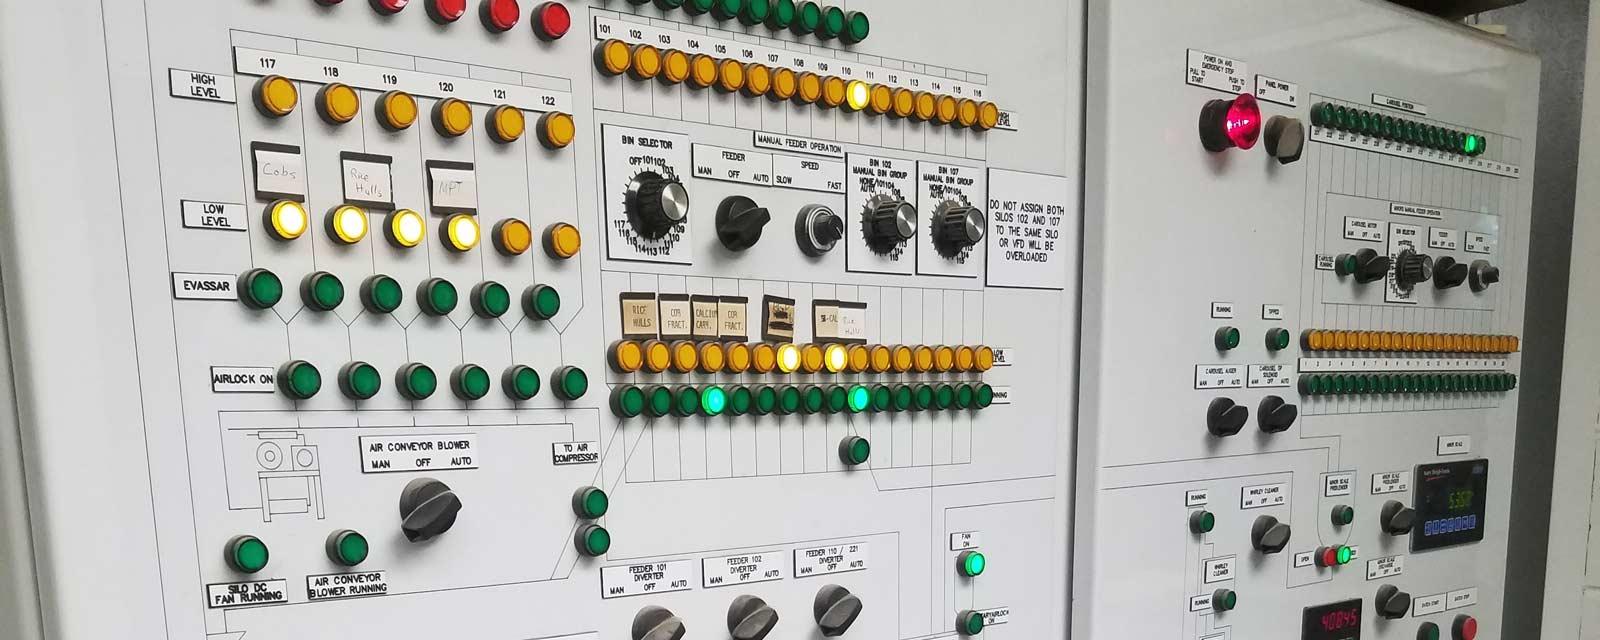 Agri-King Batching System Control Panel